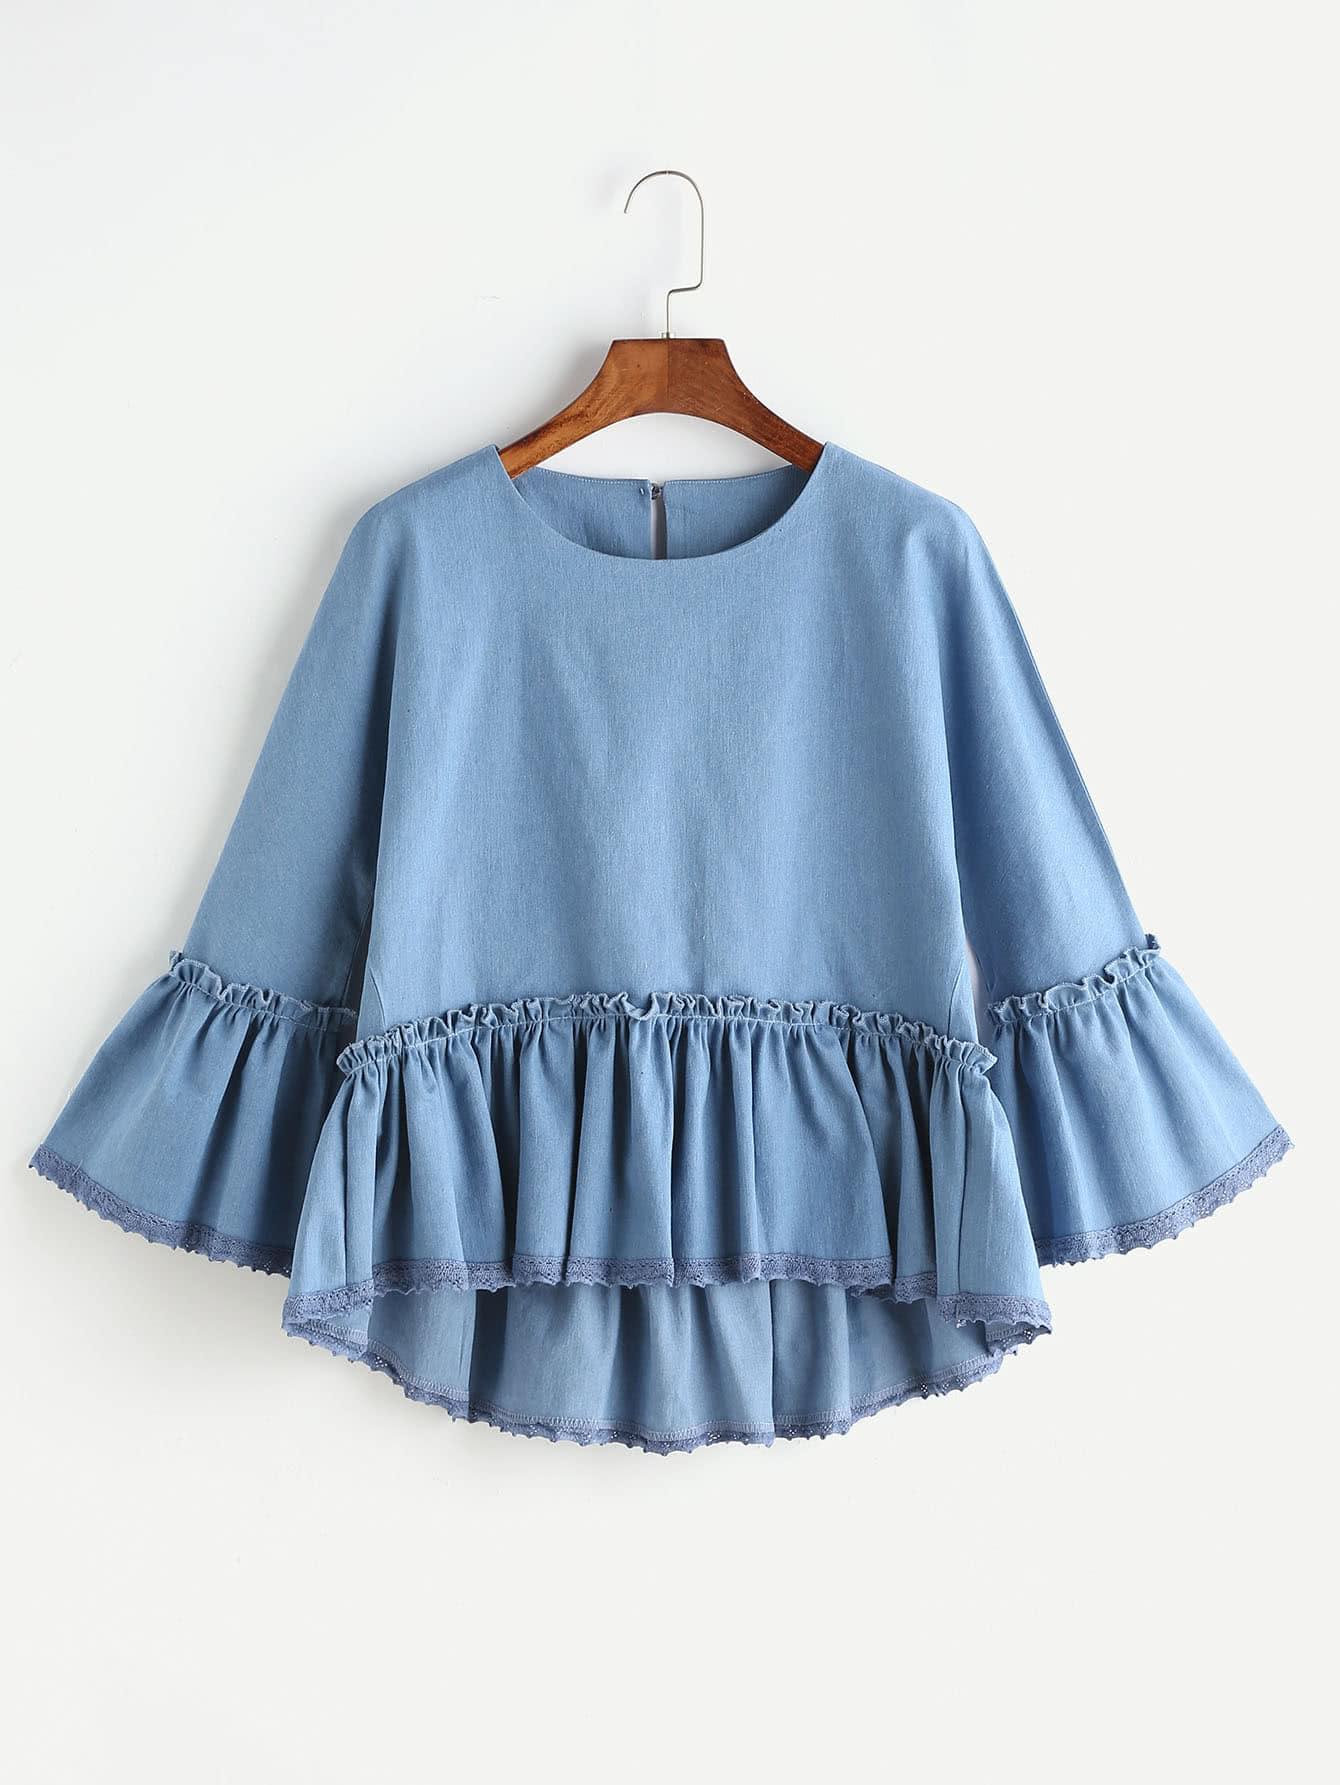 Blue Ruffle Trim Bell Sleeve High Low Denim Top ruffle trim high waisted high low skirt